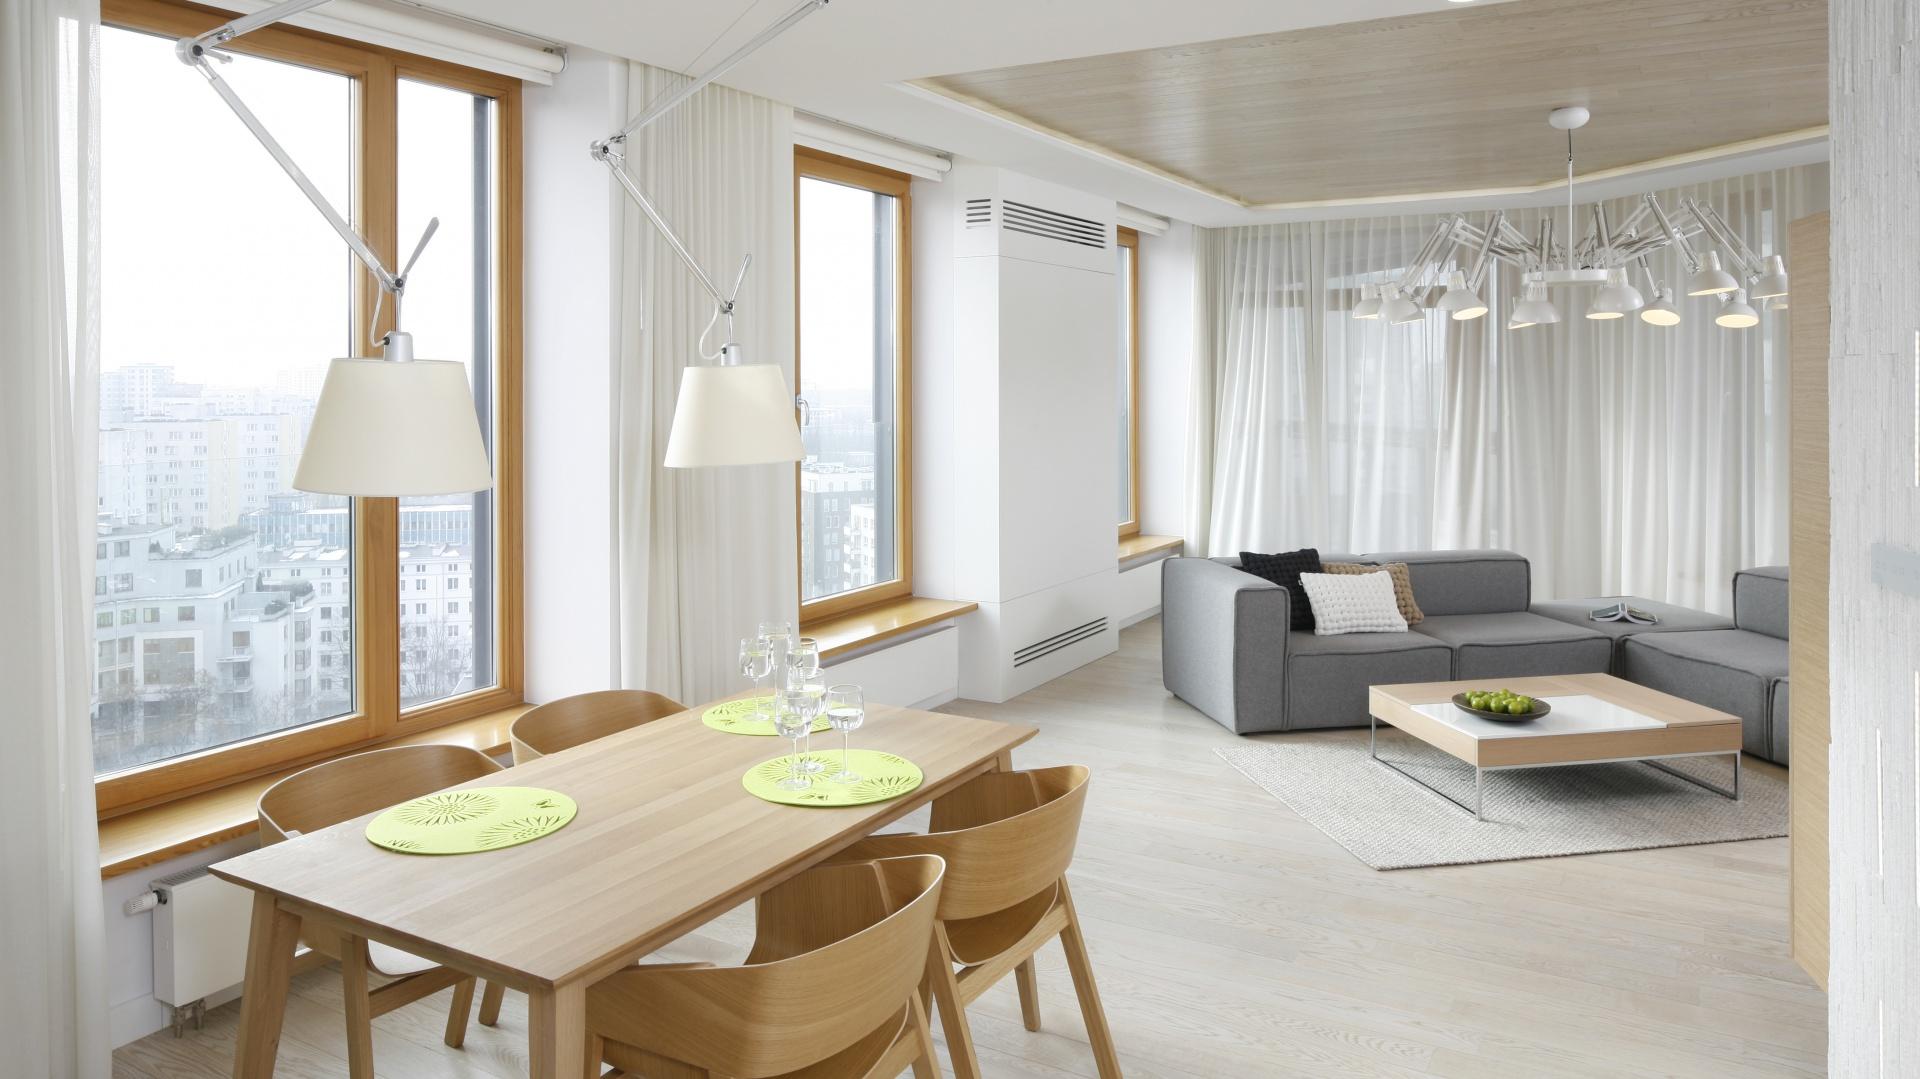 W stylu skandynawskim na salon z jadalni zobacz for 30m2 wohnzimmer einrichten